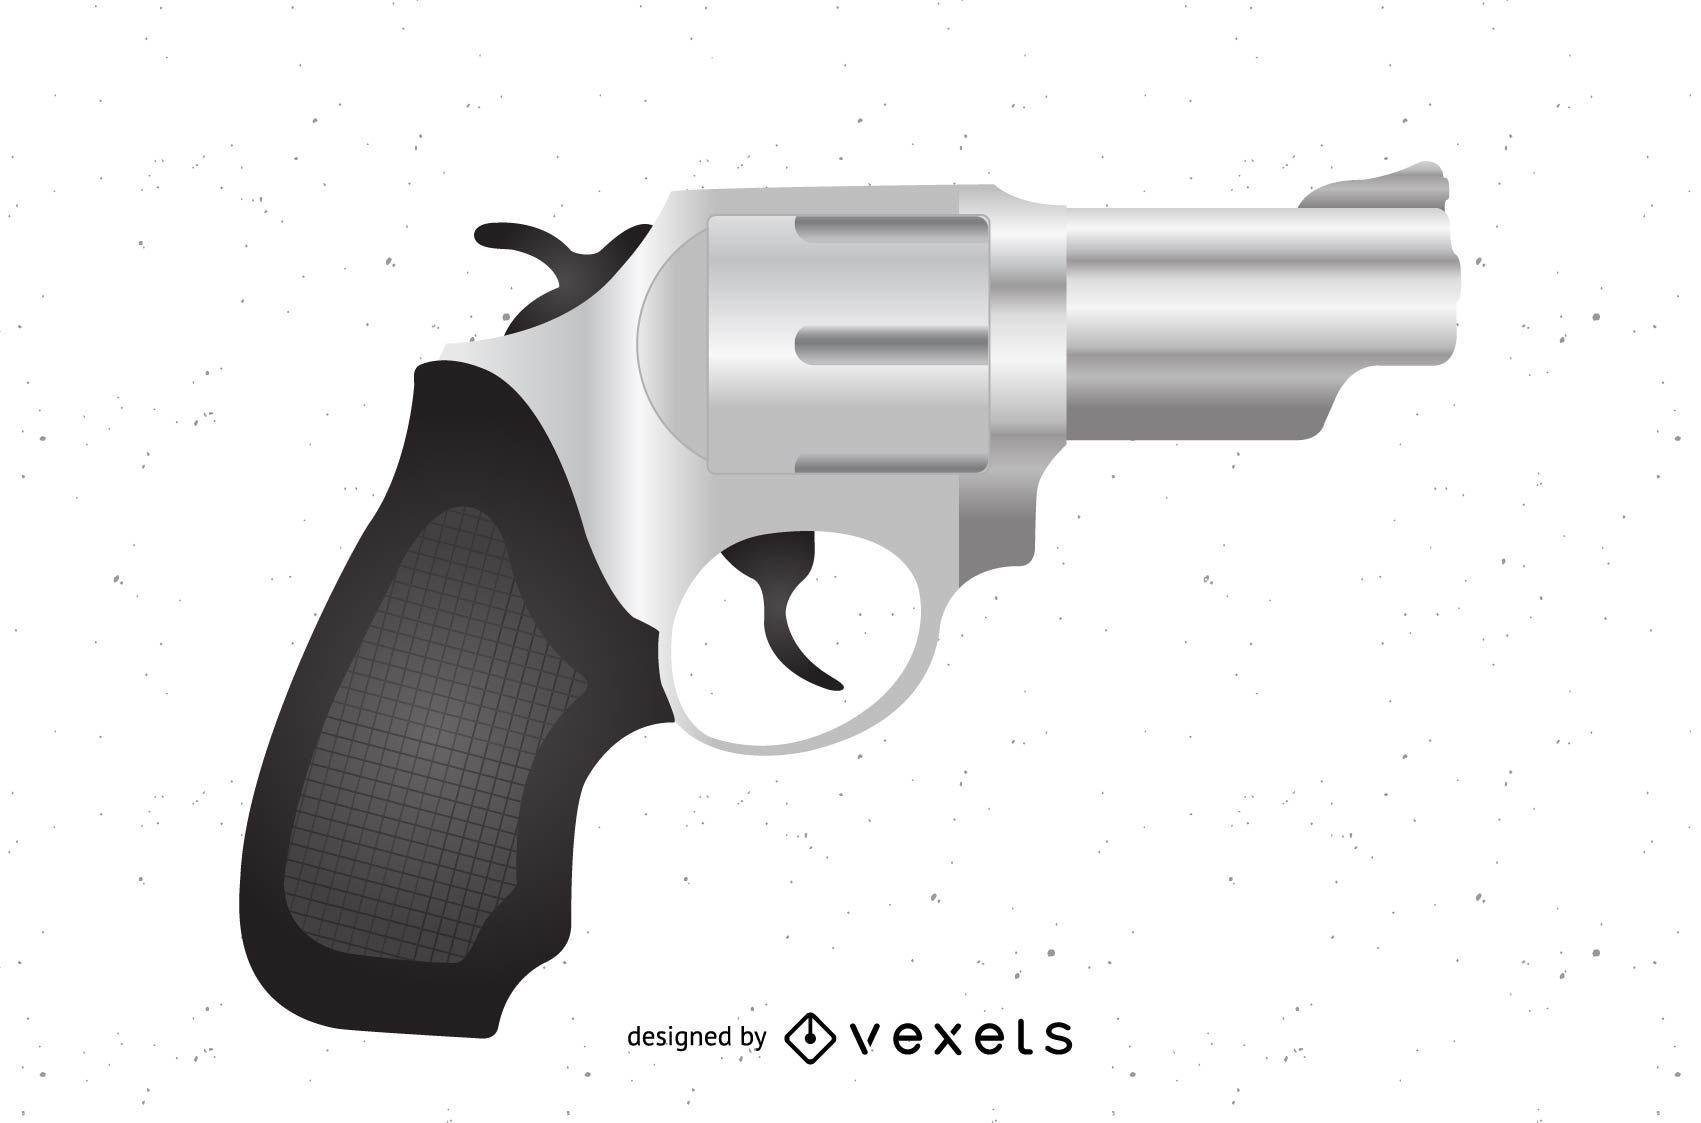 Pistol with Textured Grip